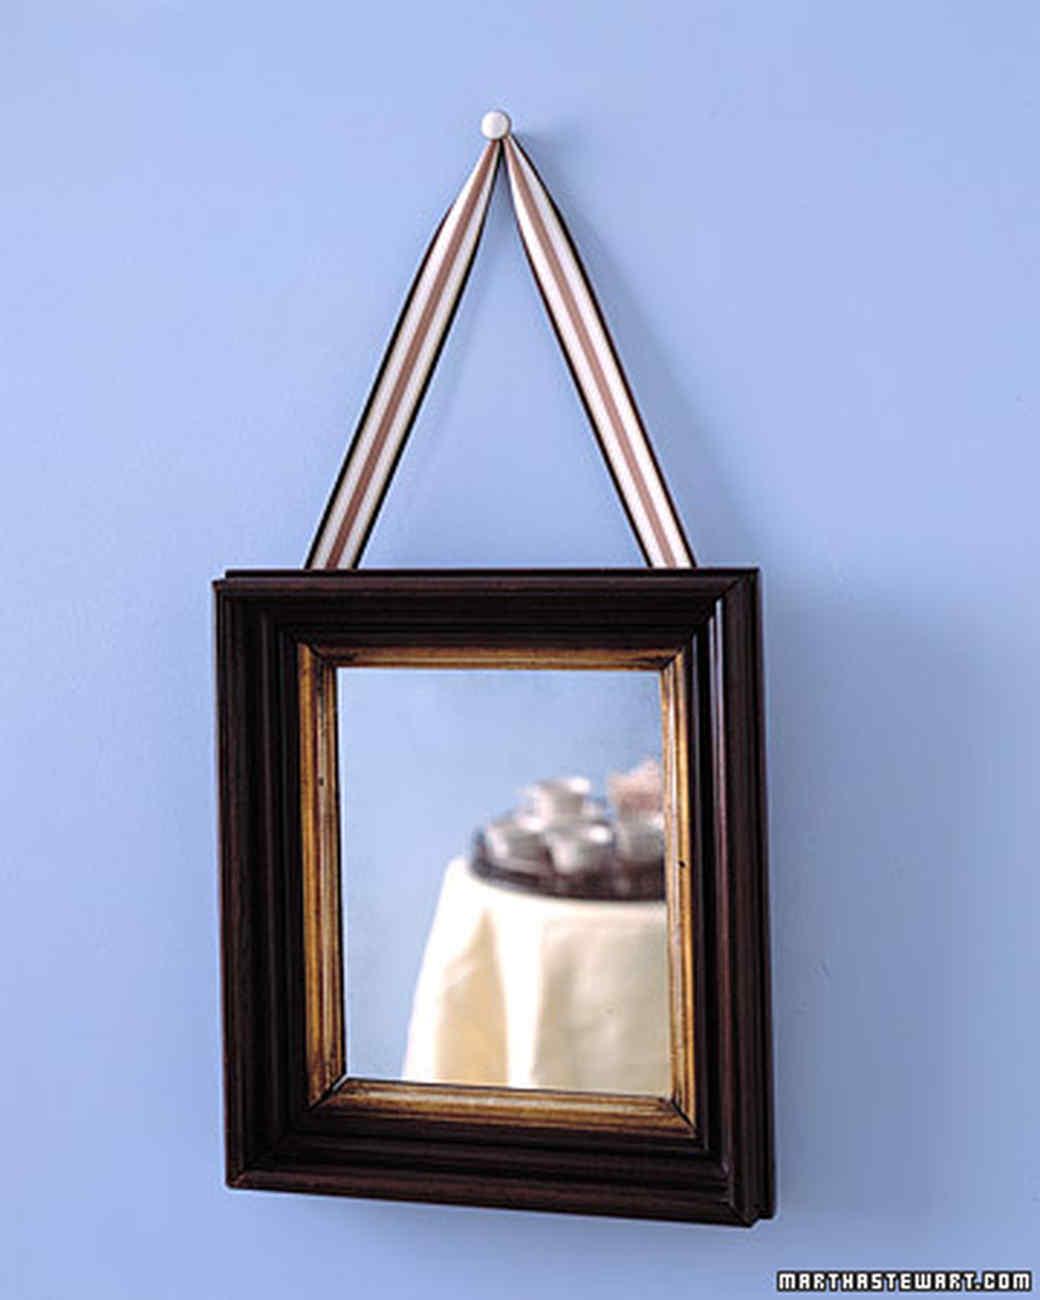 Ribbon Hanger | Martha Stewart